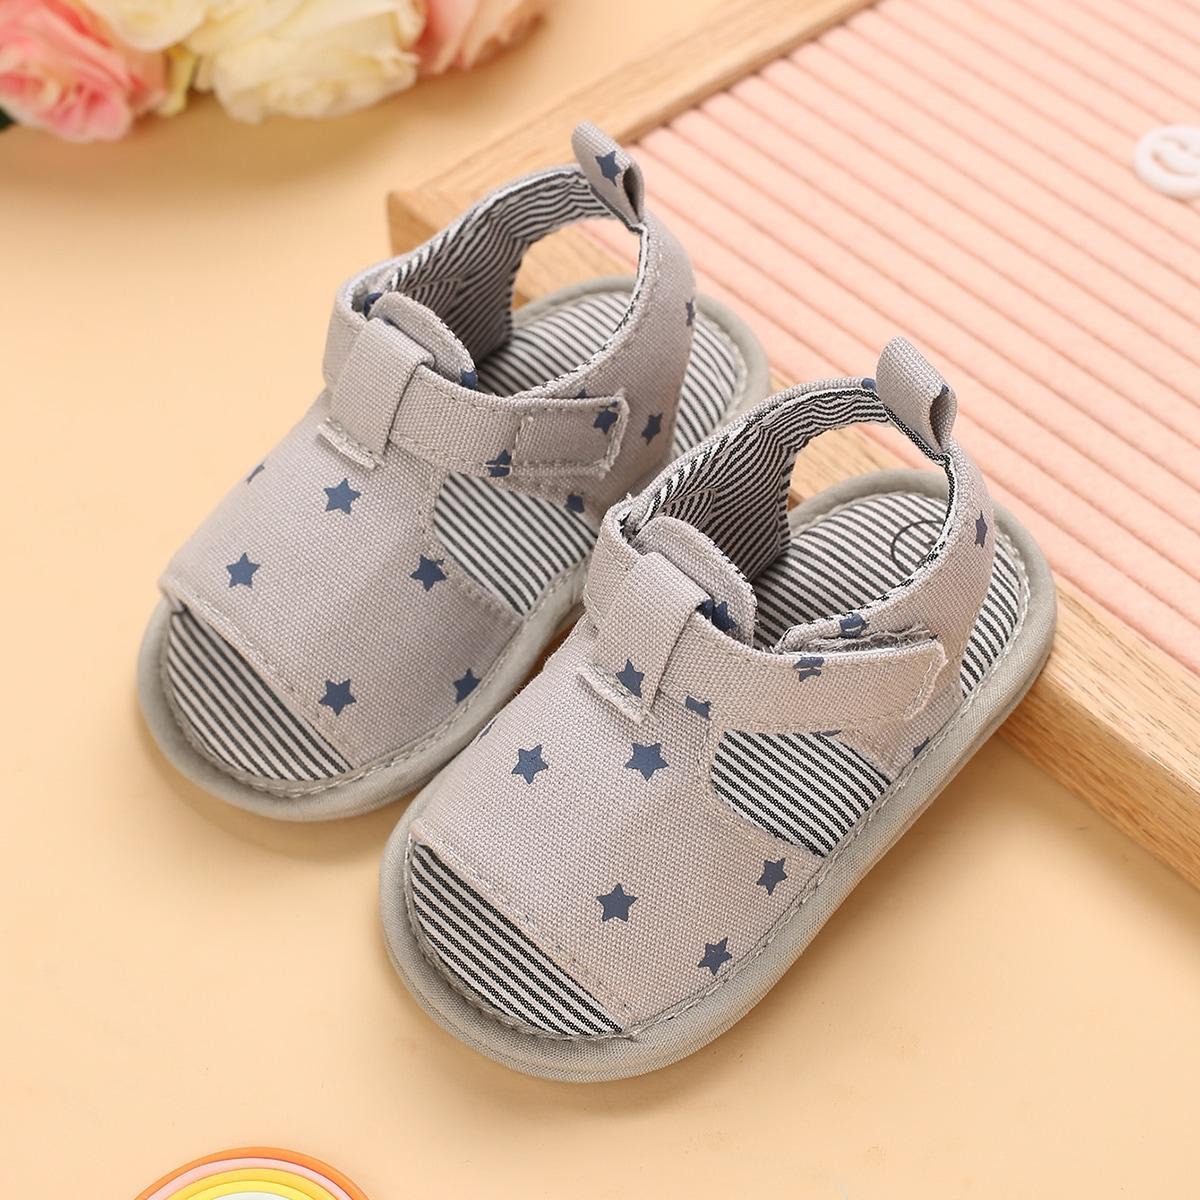 Детские сандалии на плоской подошве с узором звезды SheIn sk2108098360163119